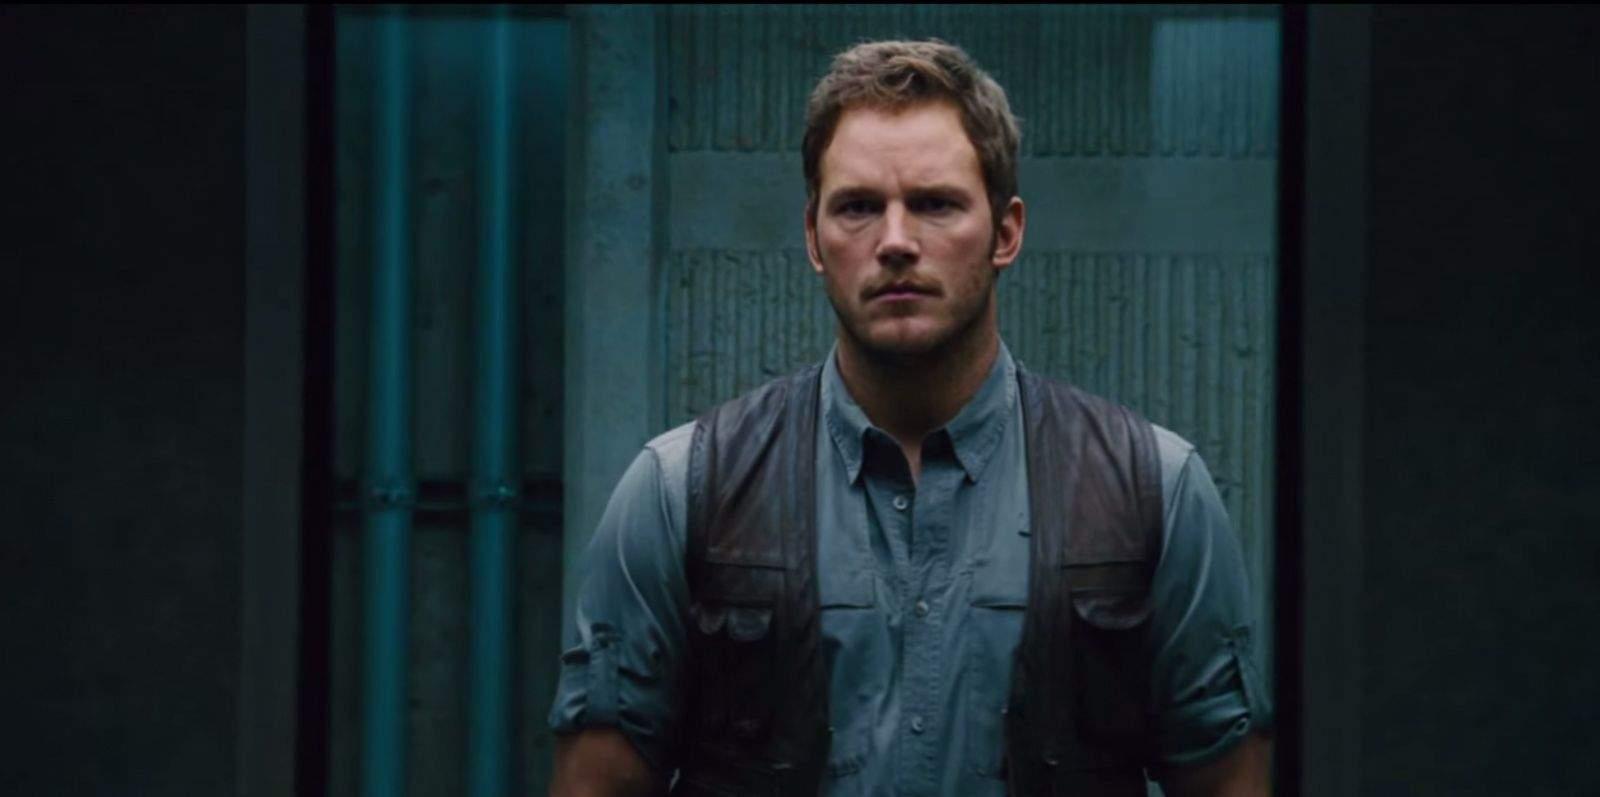 Chris Pratt seems concerned. Photo: Universal Studios